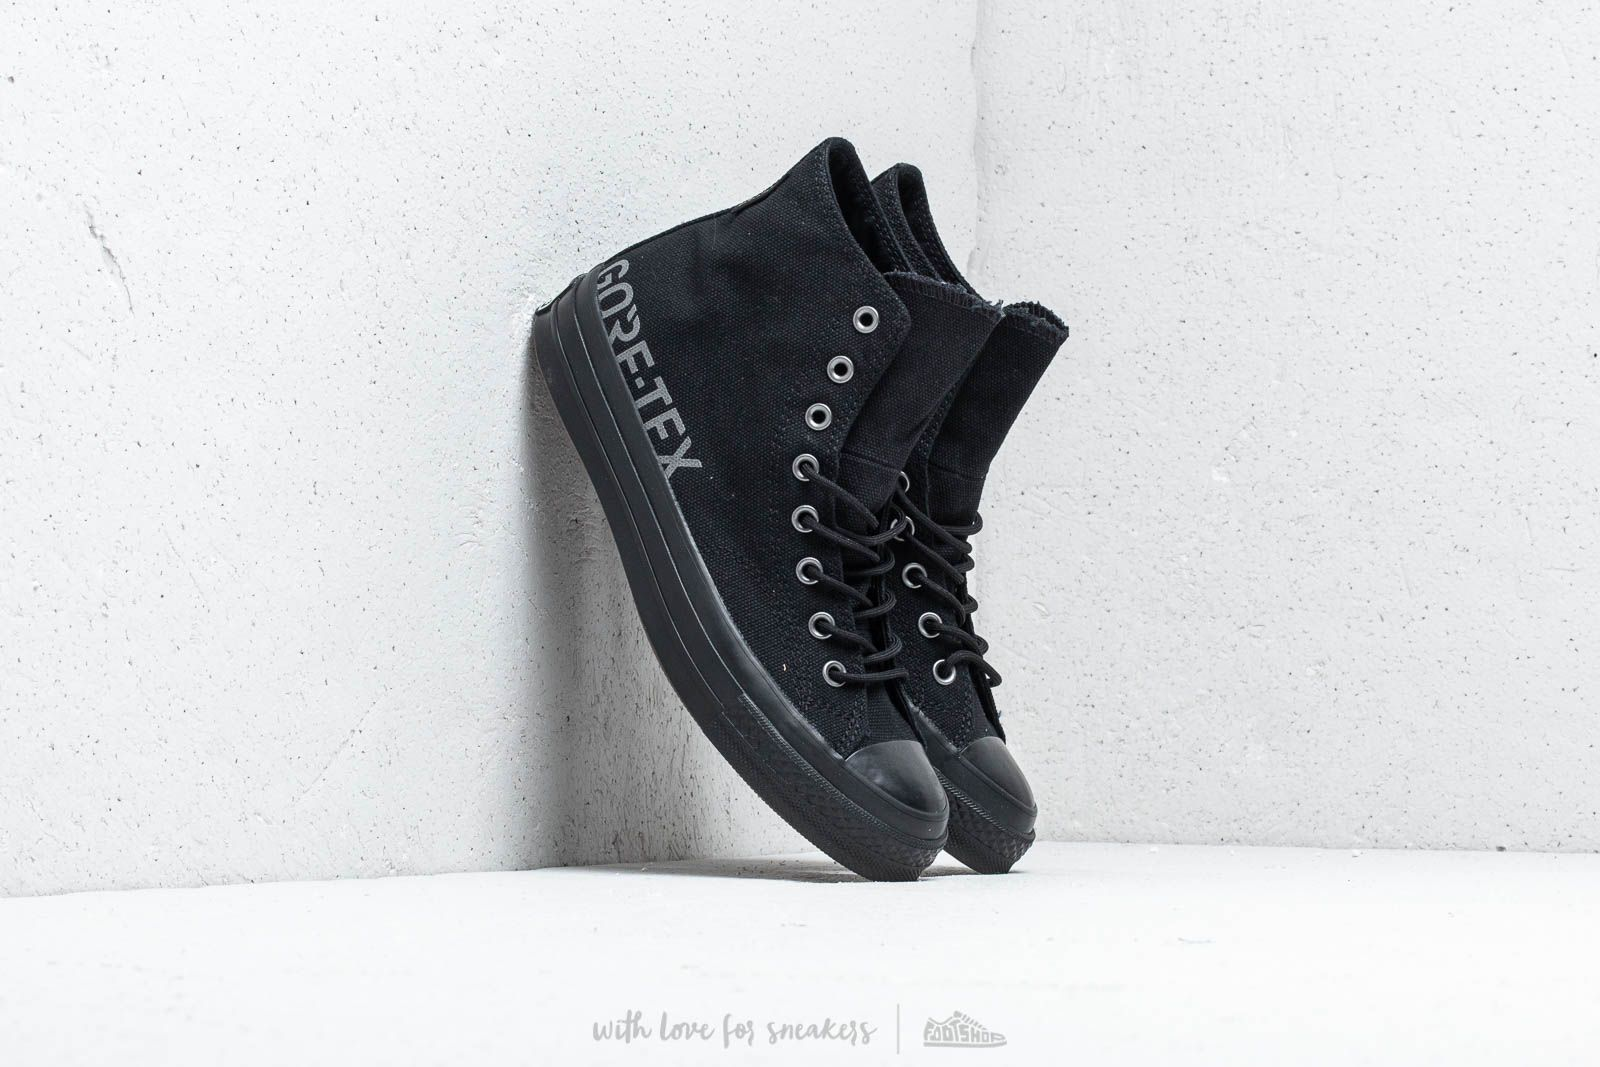 newest b8bbc e51c9 Converse Chuck 70 Hi Black  Black  Black at a great price 121 € buy